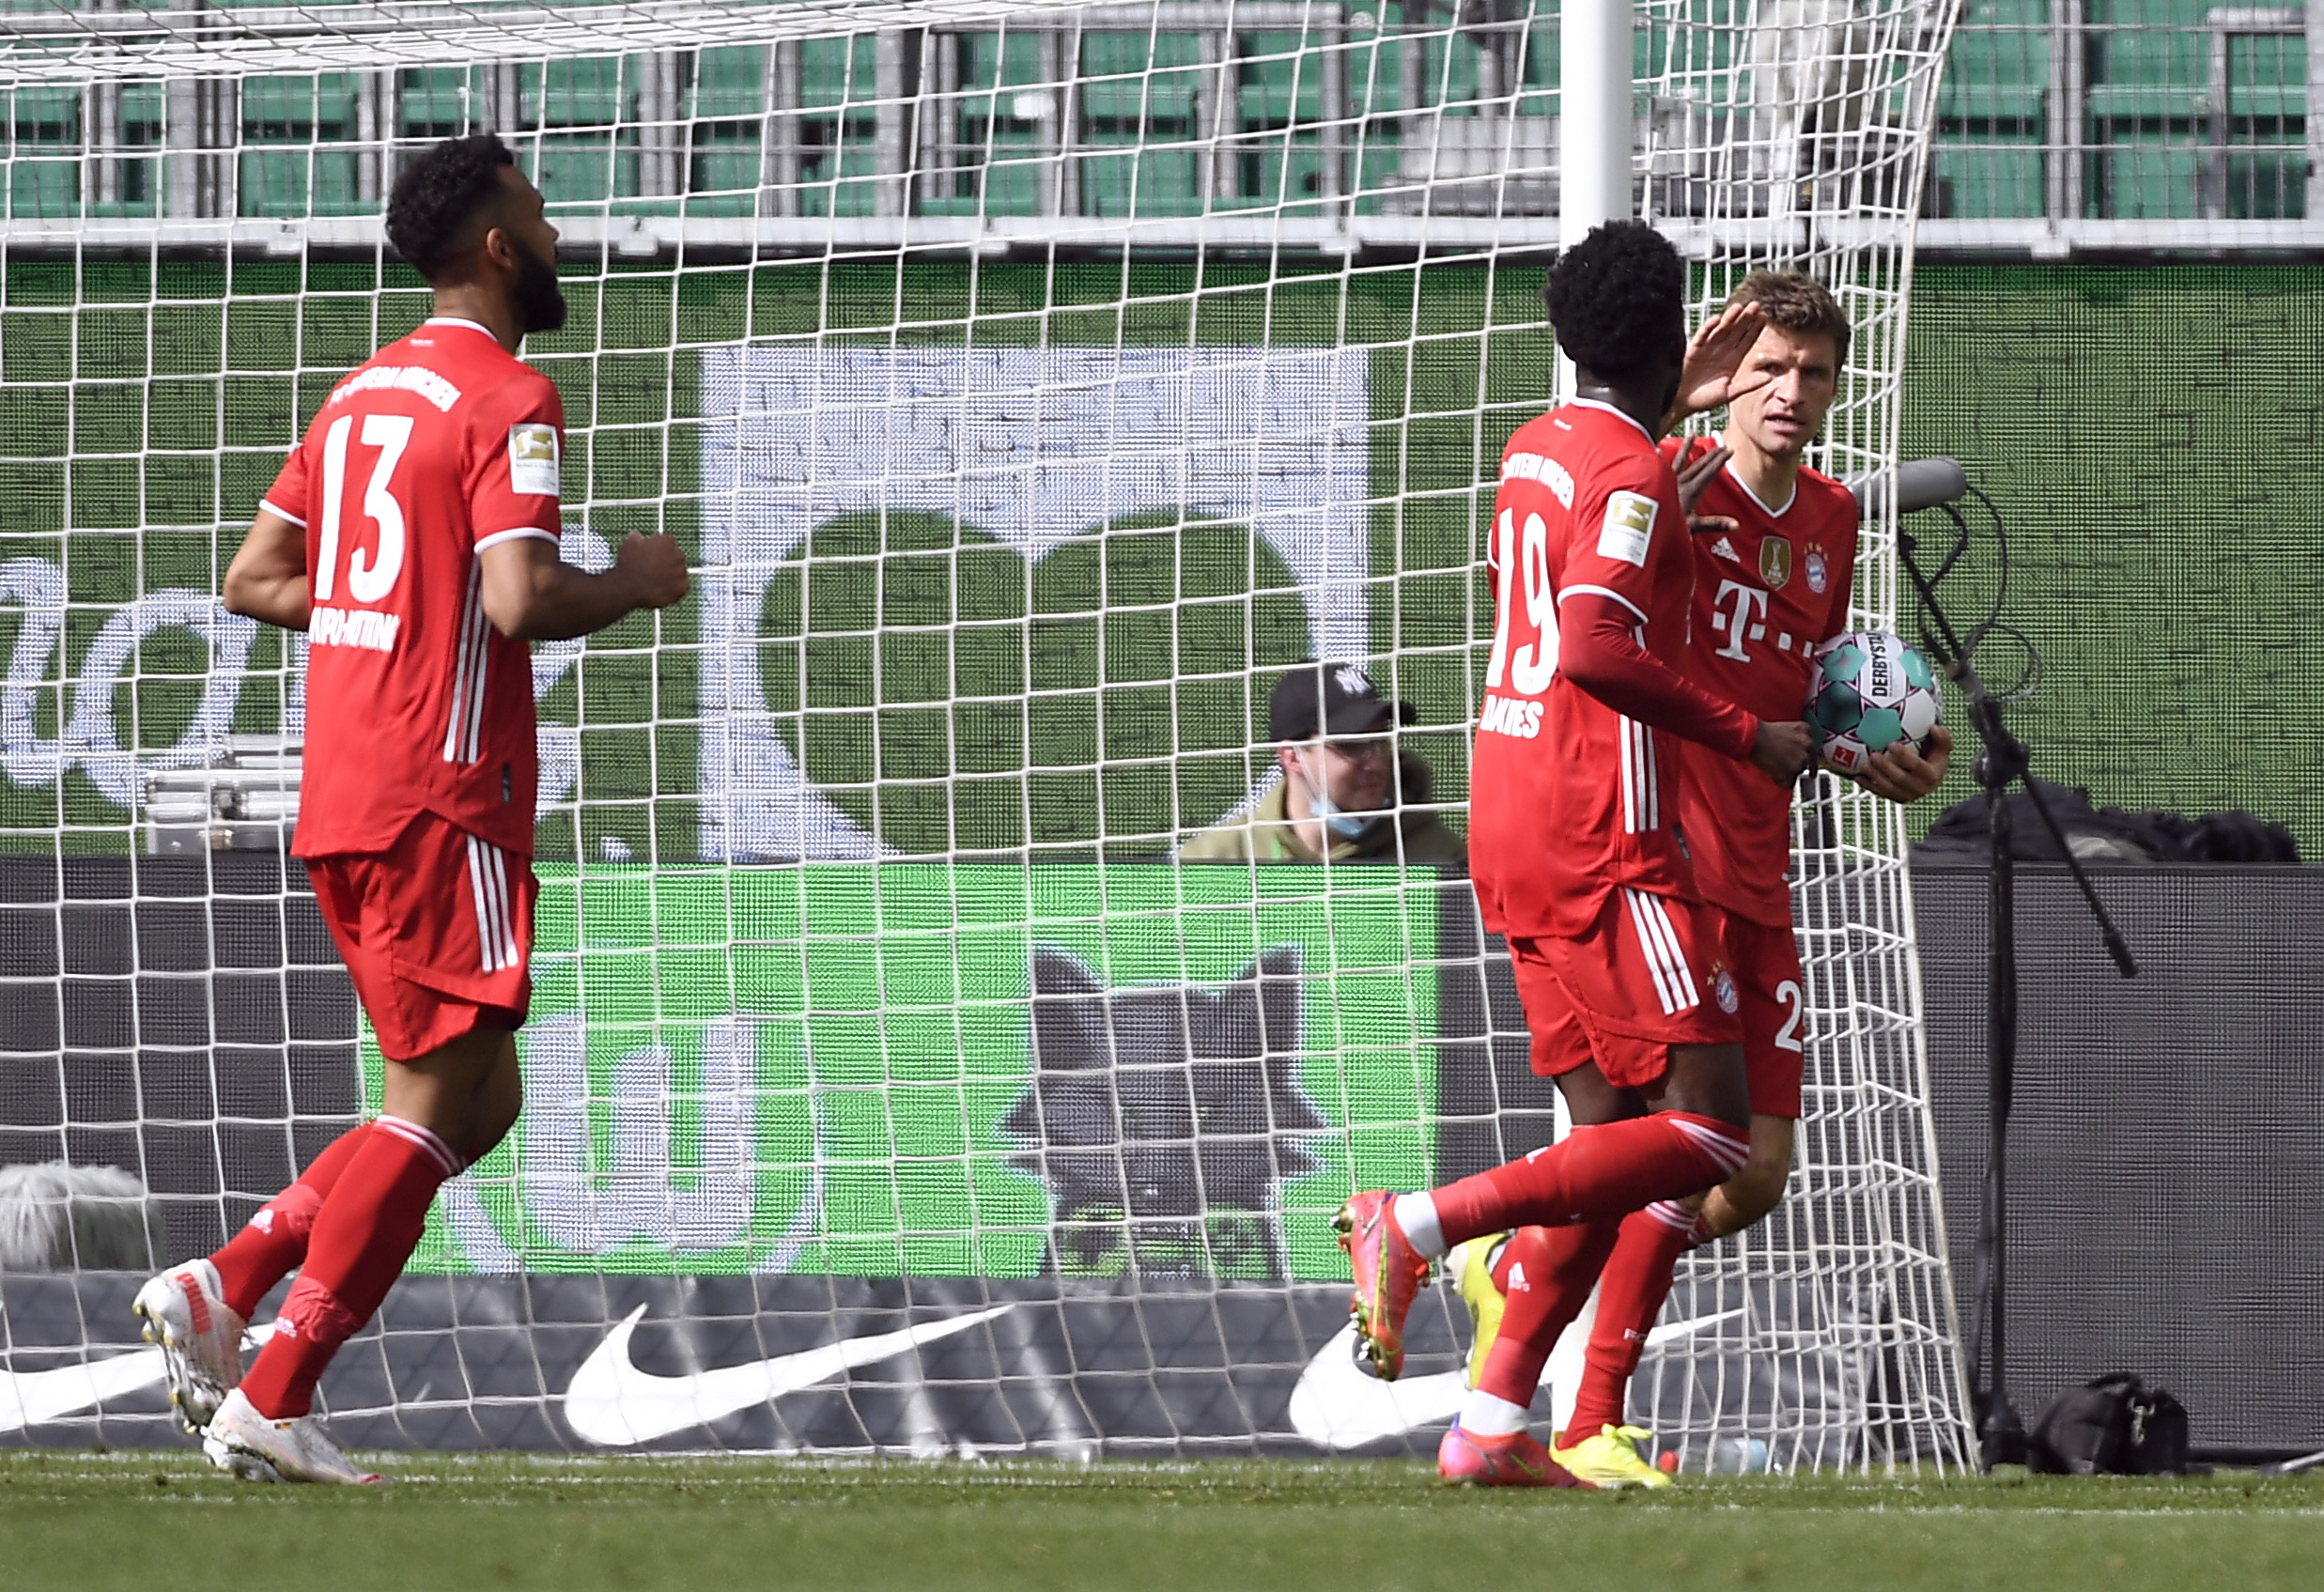 Bundesliga: Διπλό τίτλου με 18χρονο «Λεβαντόφσκι» για την Μπάγερν Μονάχου